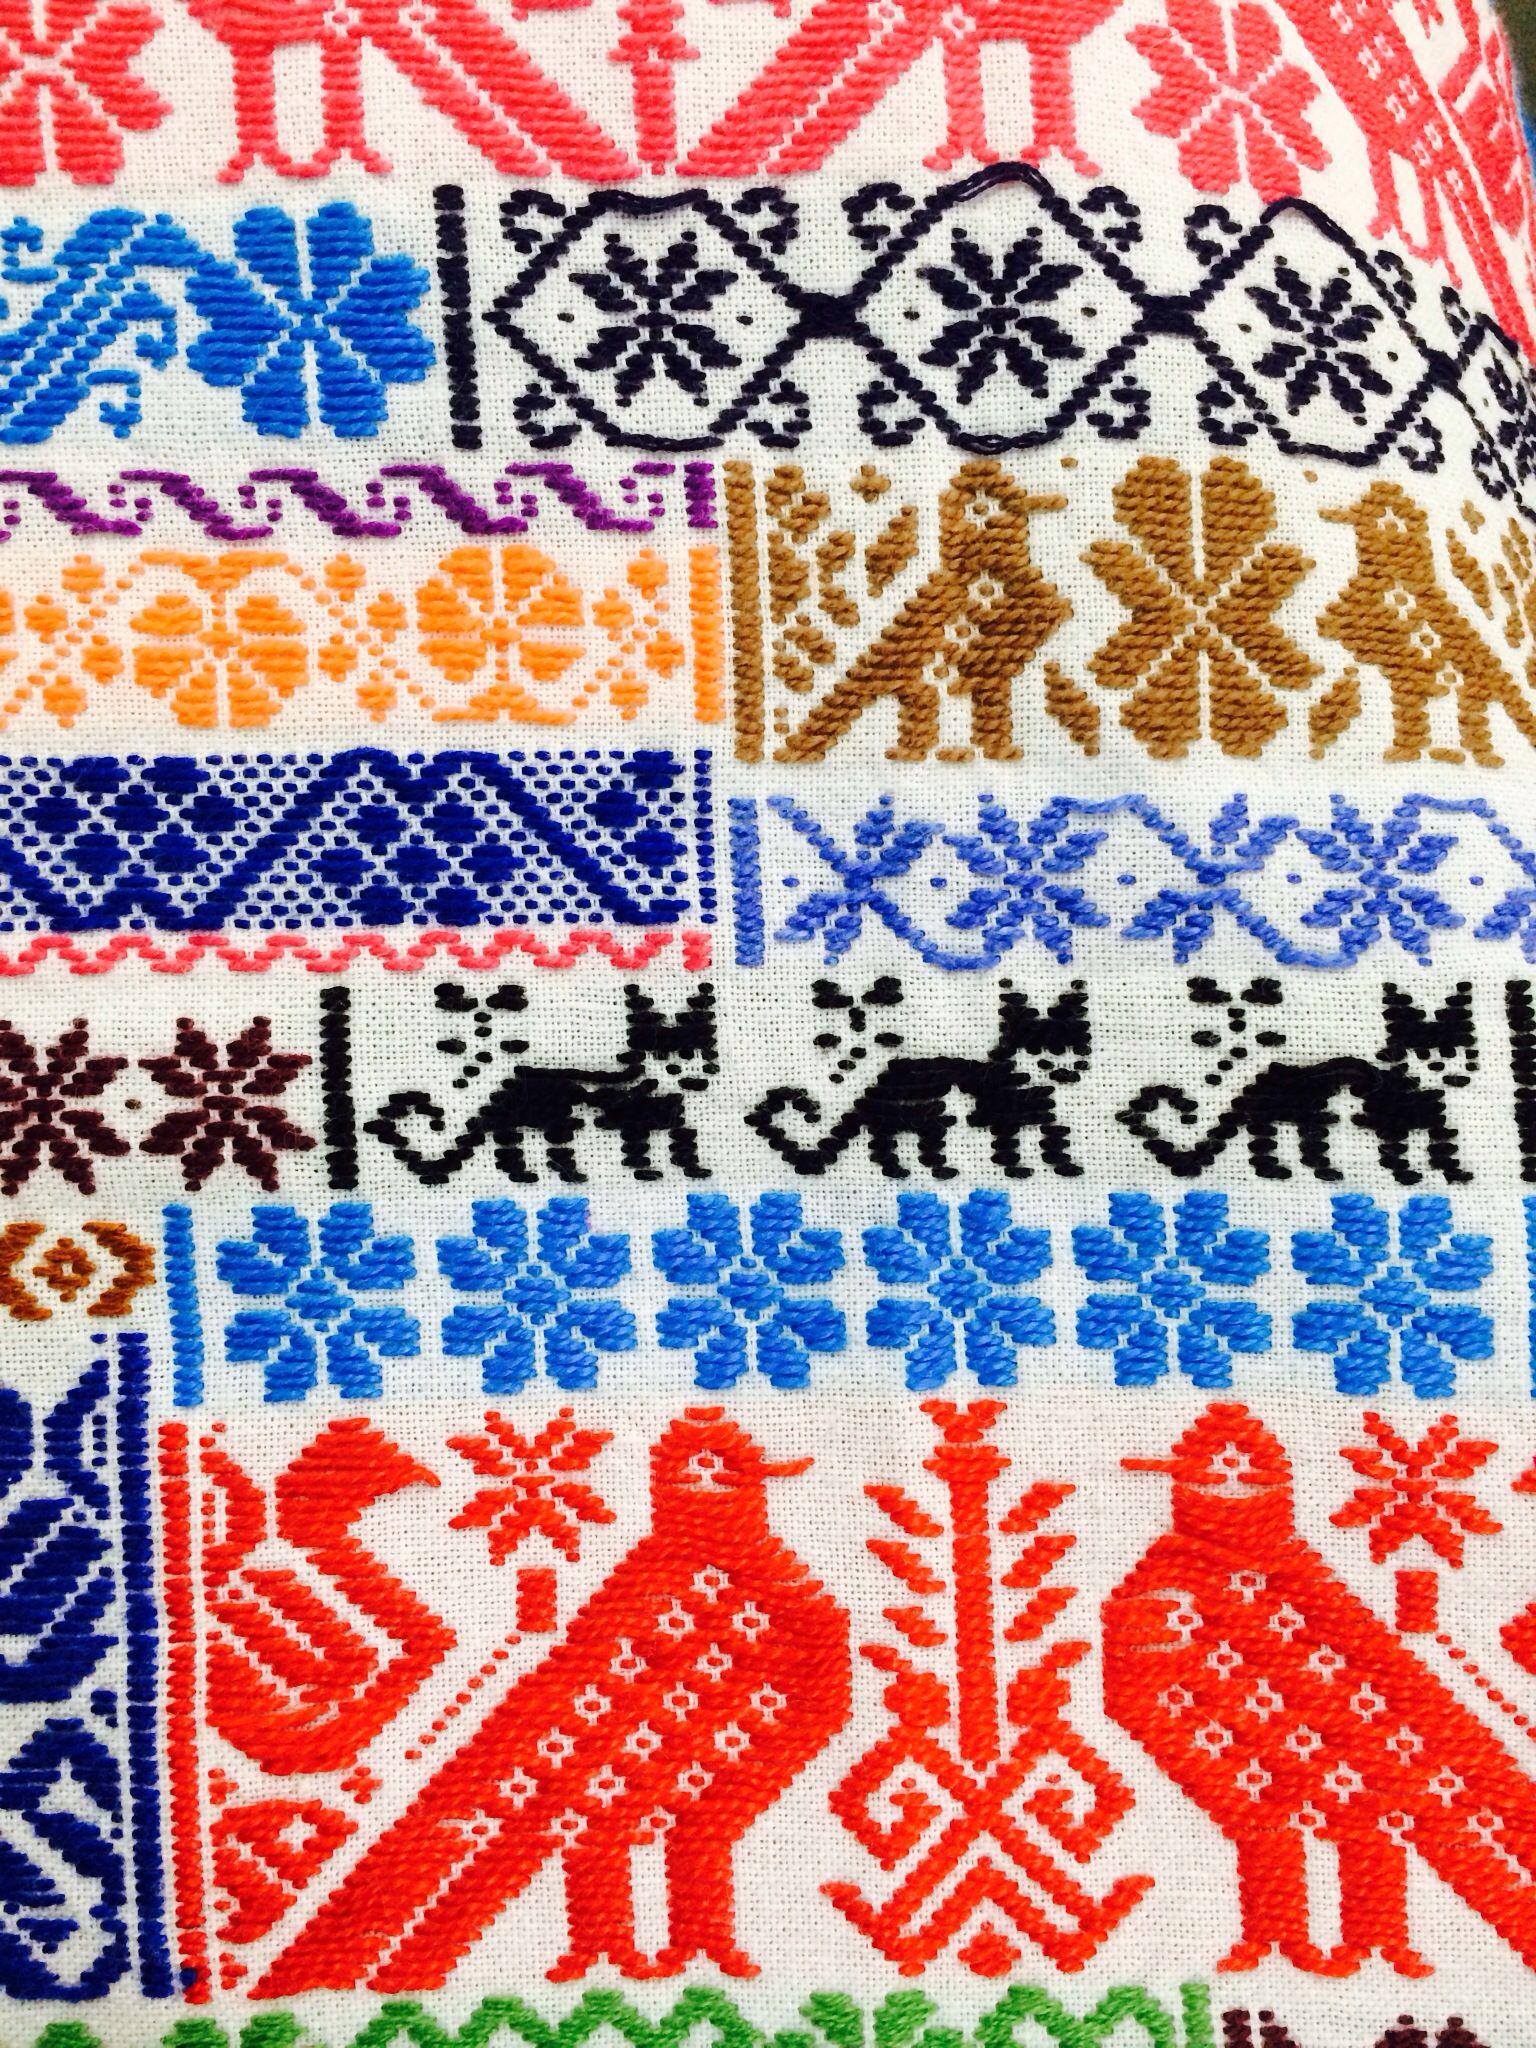 Textil mexicano dise os mexicanos pinterest textiles - Disenos textiles del mediterraneo ...